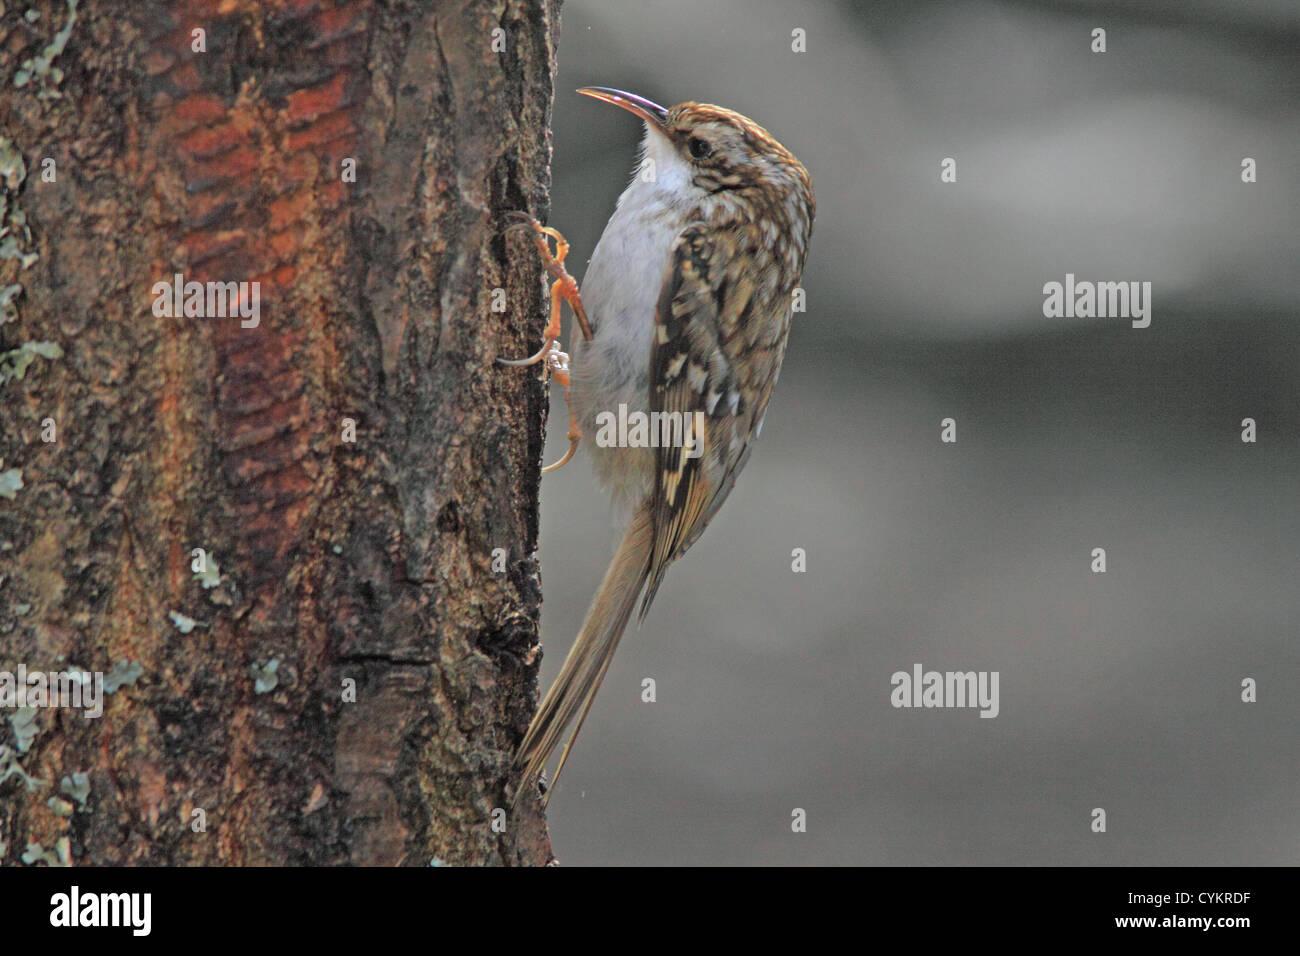 UK Britain Tree Creeper - Stock Image